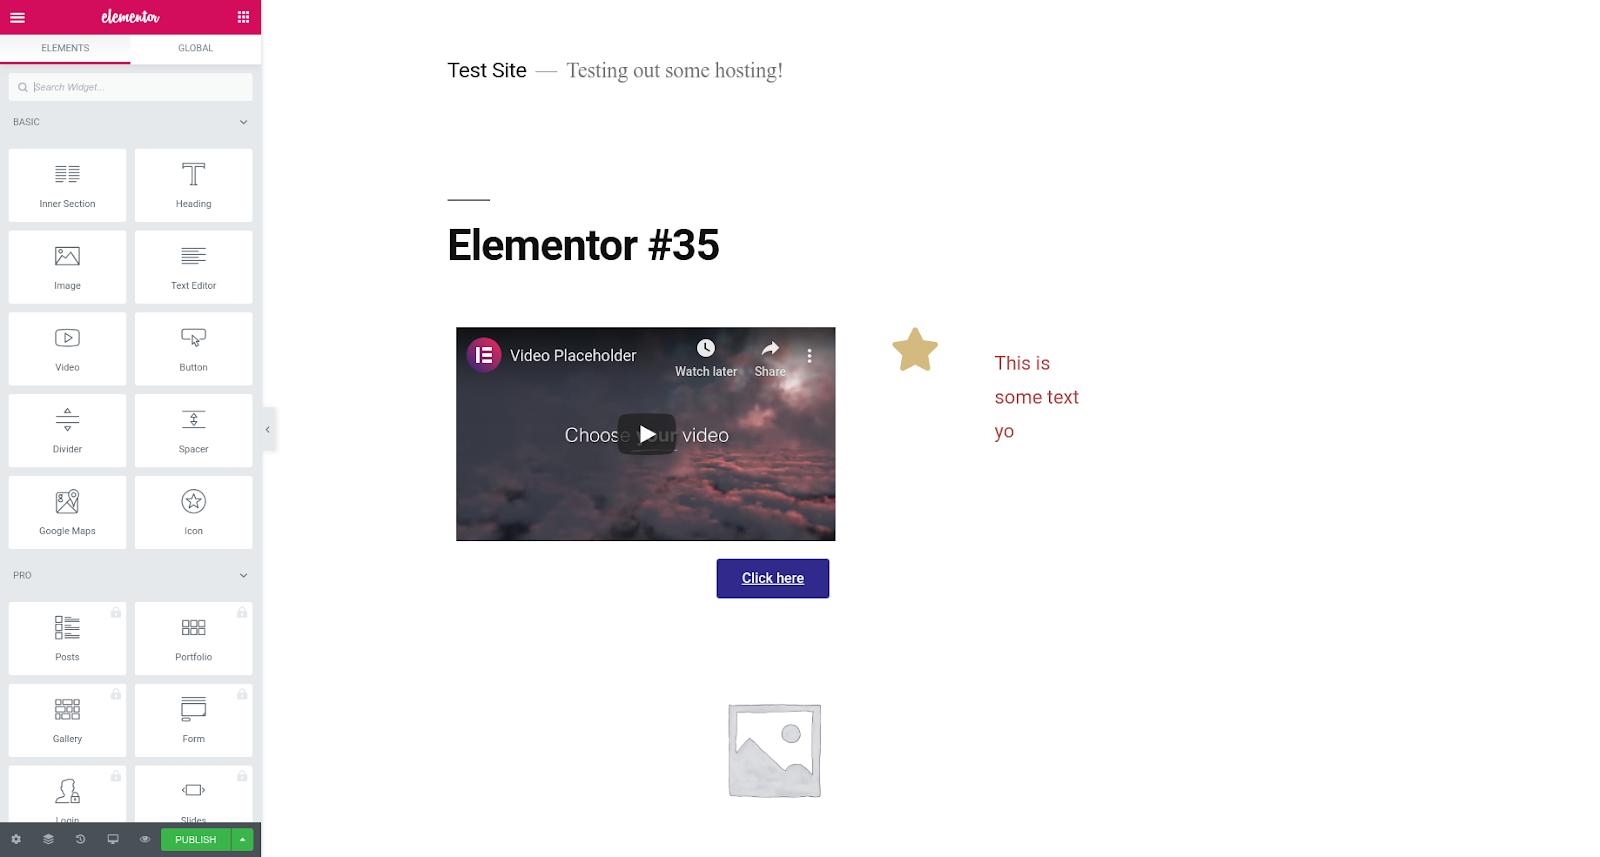 elementor wordpress page builder plugin features